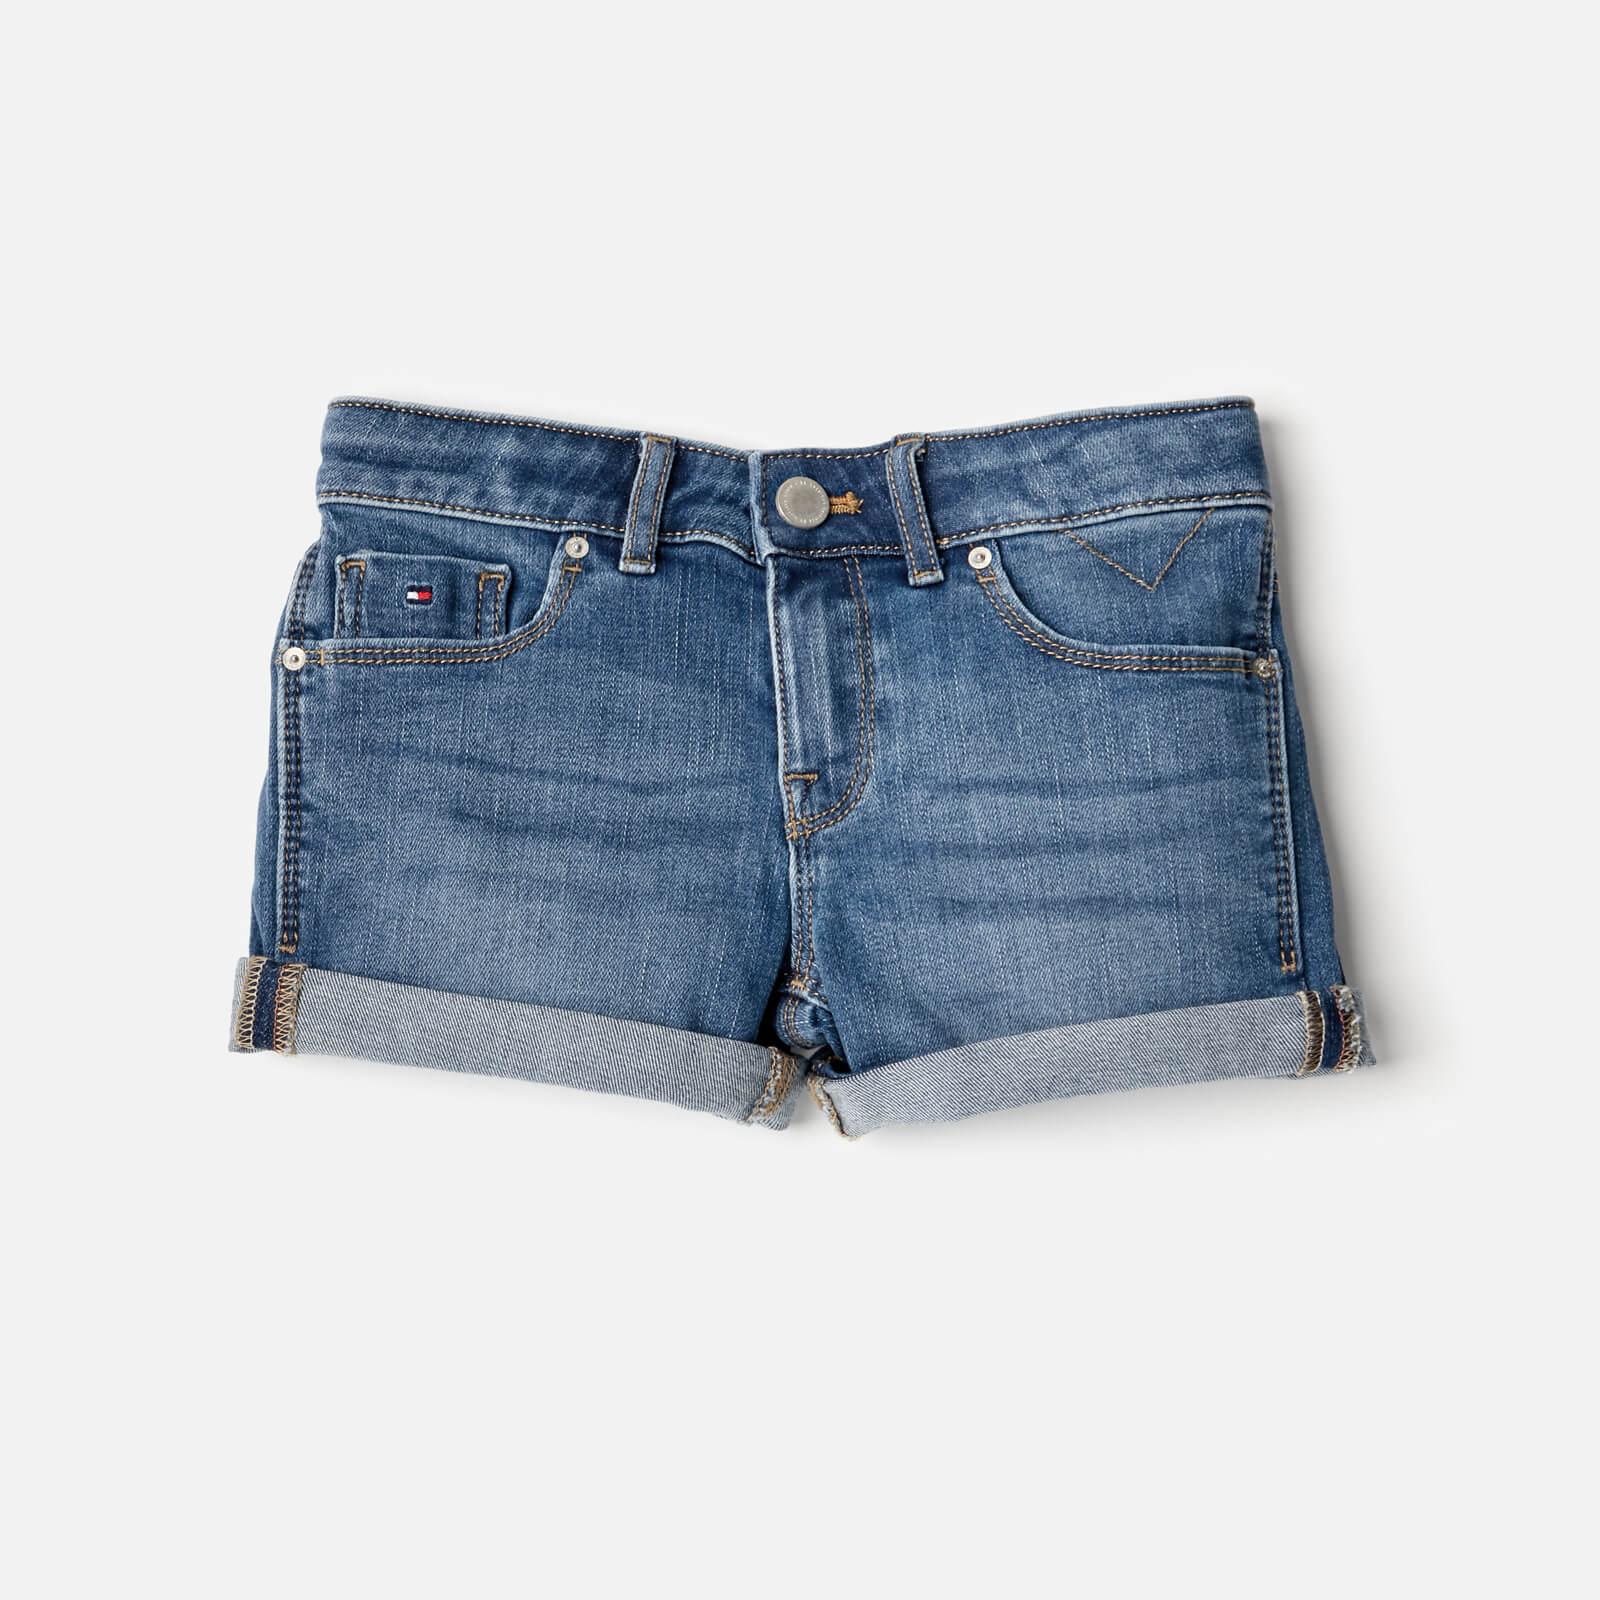 0834e7241bf Tommy Hilfiger Girls' Nora Stretch Denim Shorts - Clifton Mid Blue Clothing    TheHut.com